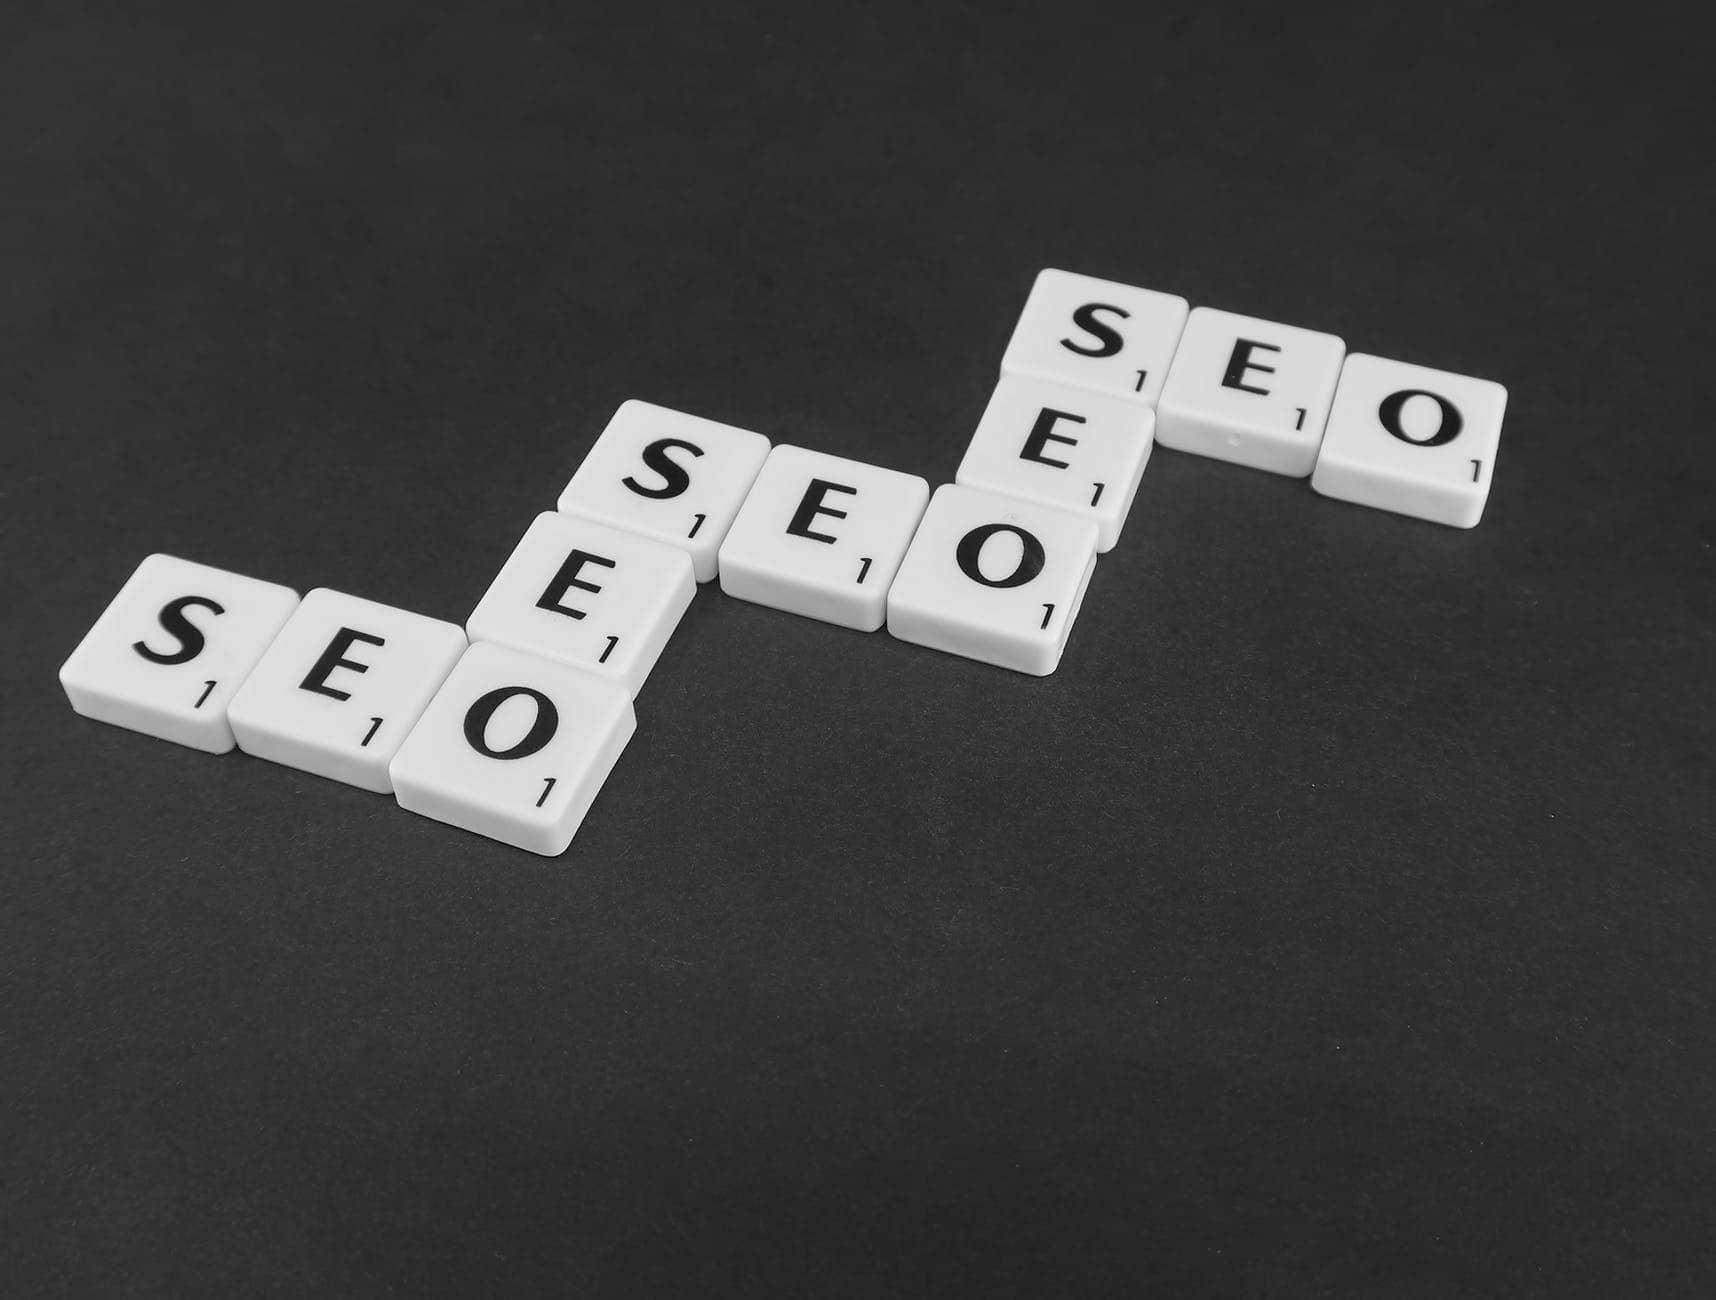 Top 7 Wordpress SEO Tools - Be ahead of the game